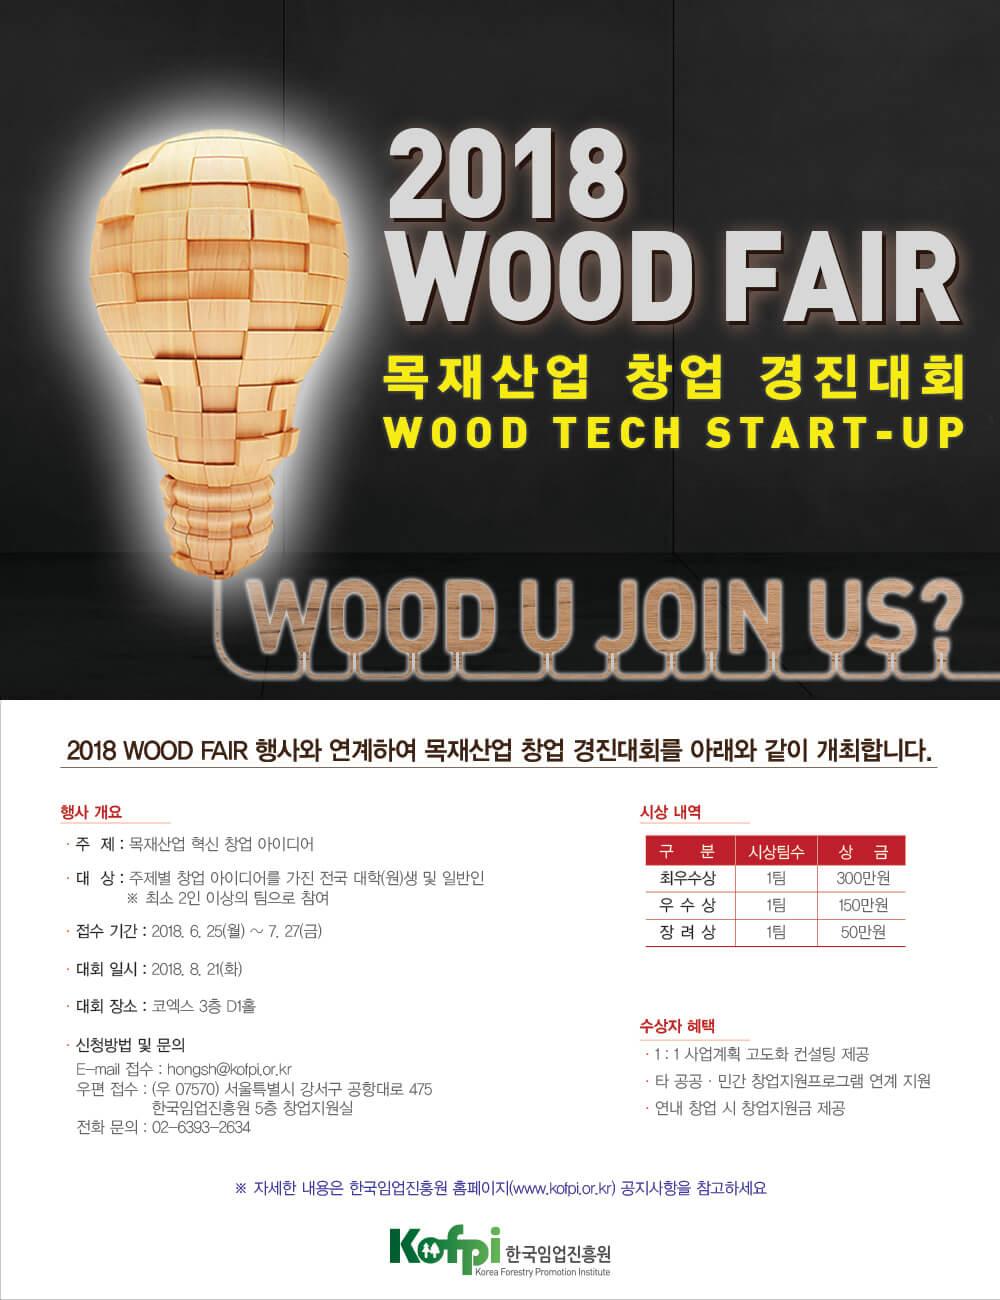 2018 WOOD FAIR 목재산업 창업(Wood Tech Start-up) 경진대회